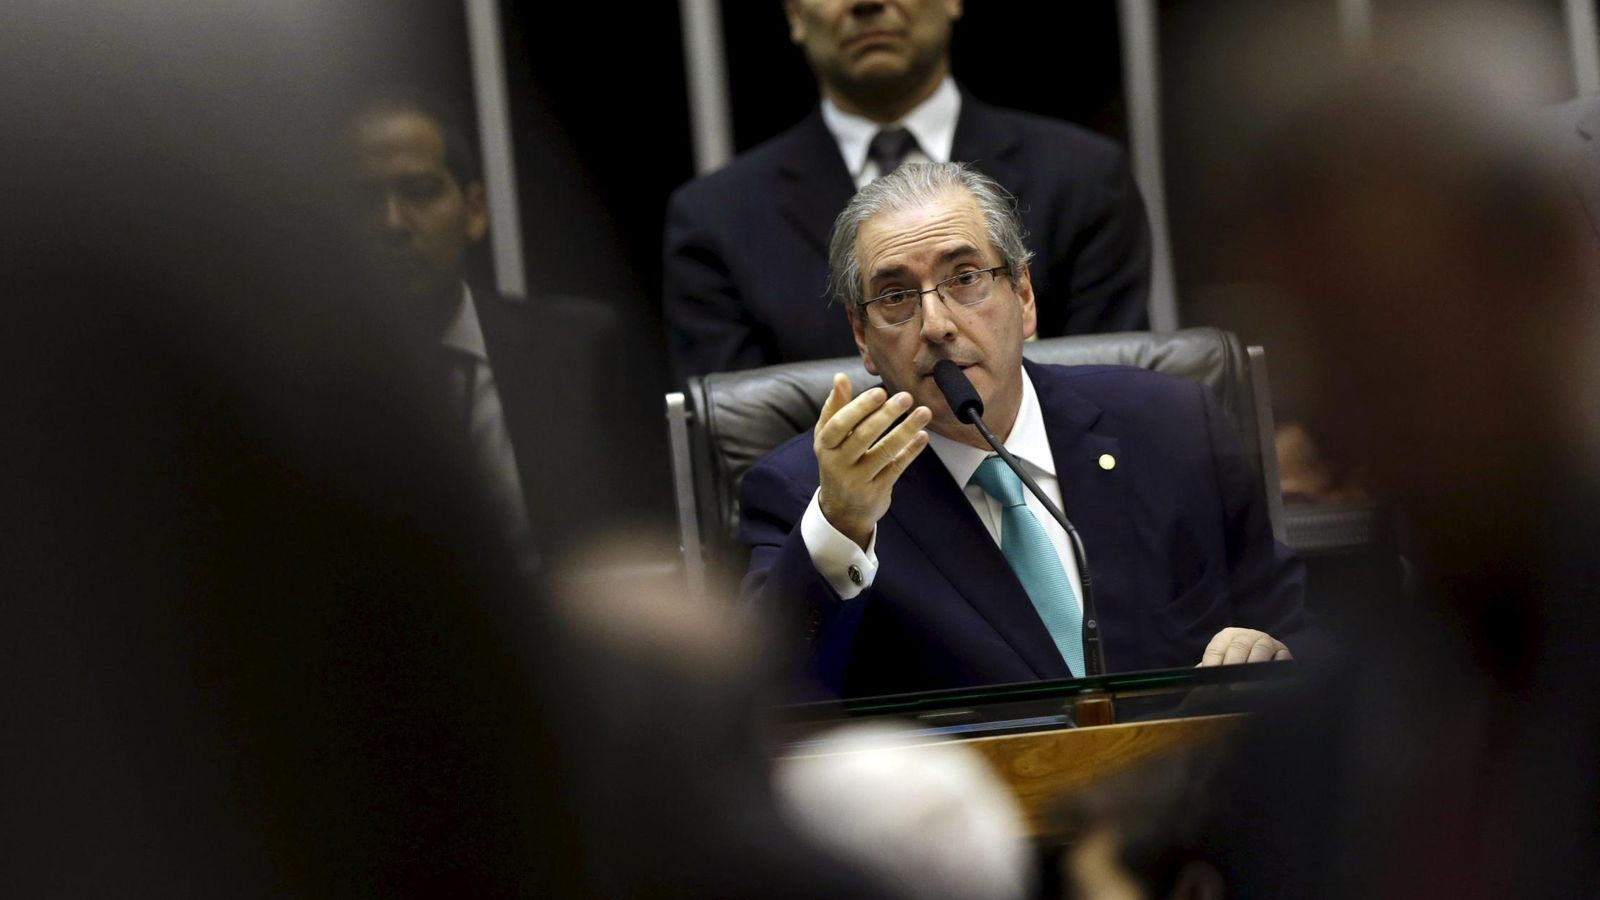 Foto: El presidente de la Cámara de Diputados brasileña, Eduardo Cunha, durante una sesión de la cámara en Brasilia, el 6 de agosto de 2015 (Reuters).